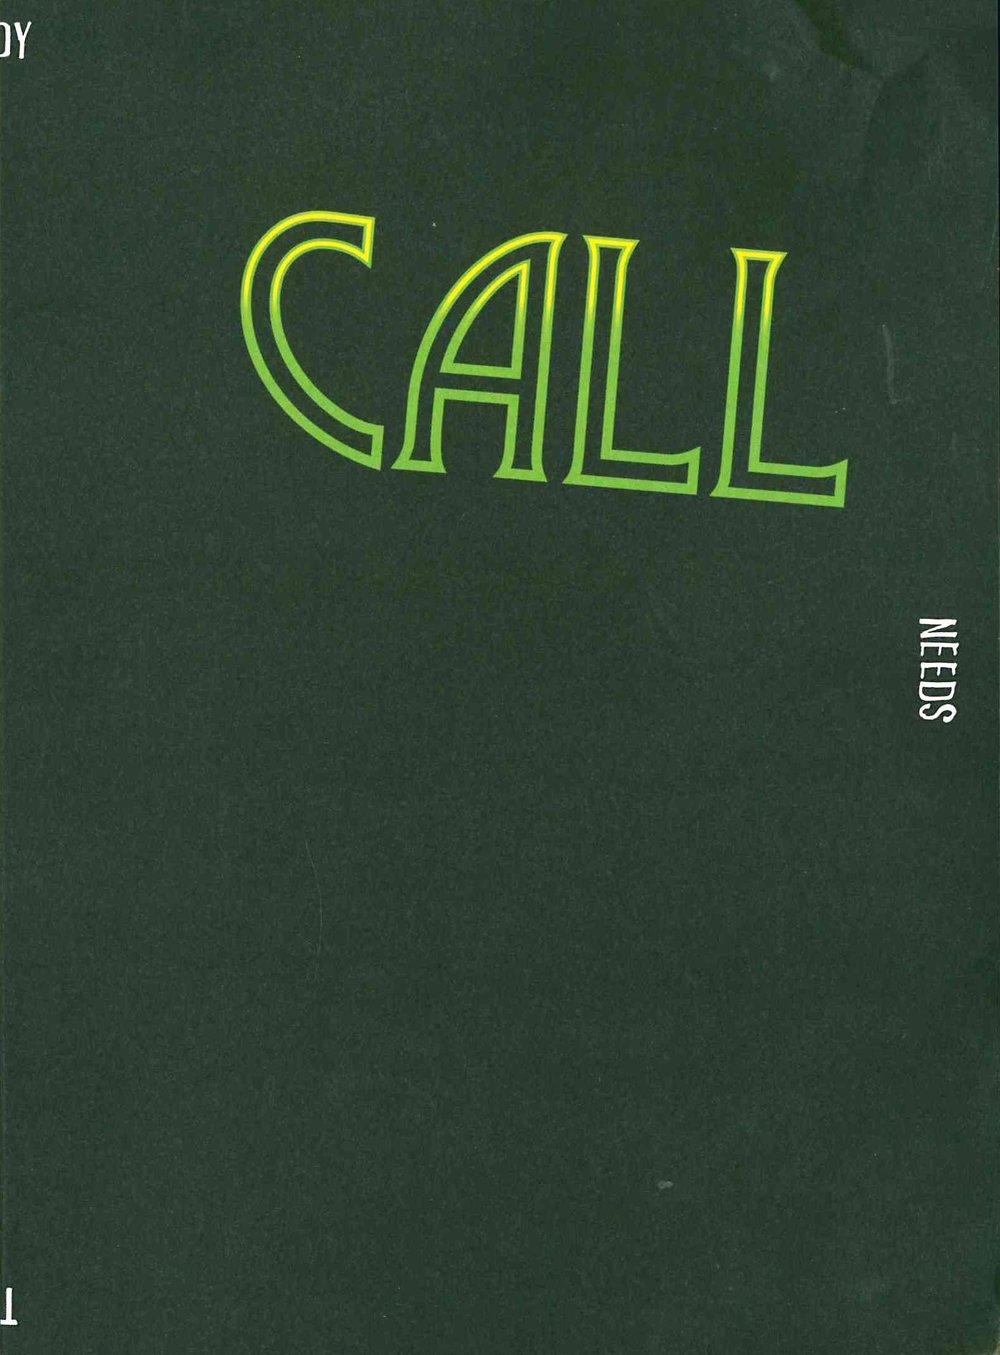 CALL 2014